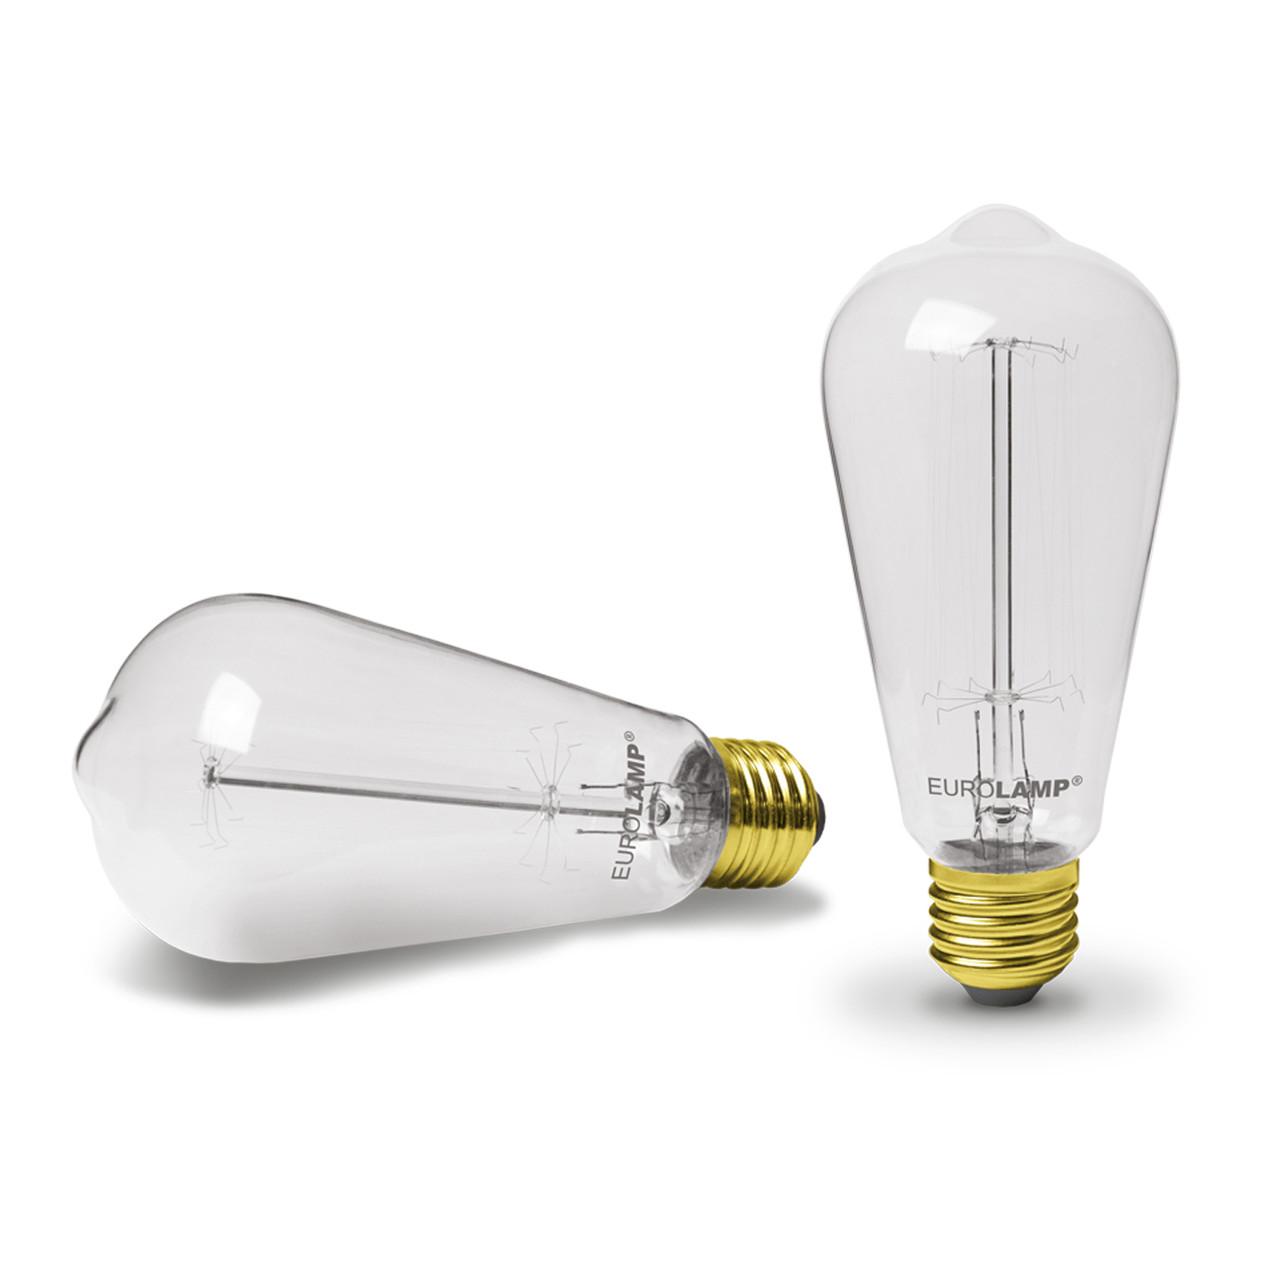 EUROLAMP Лампа ЛОН Капля ArtDeco ST64 60W E27 2700K dimmable